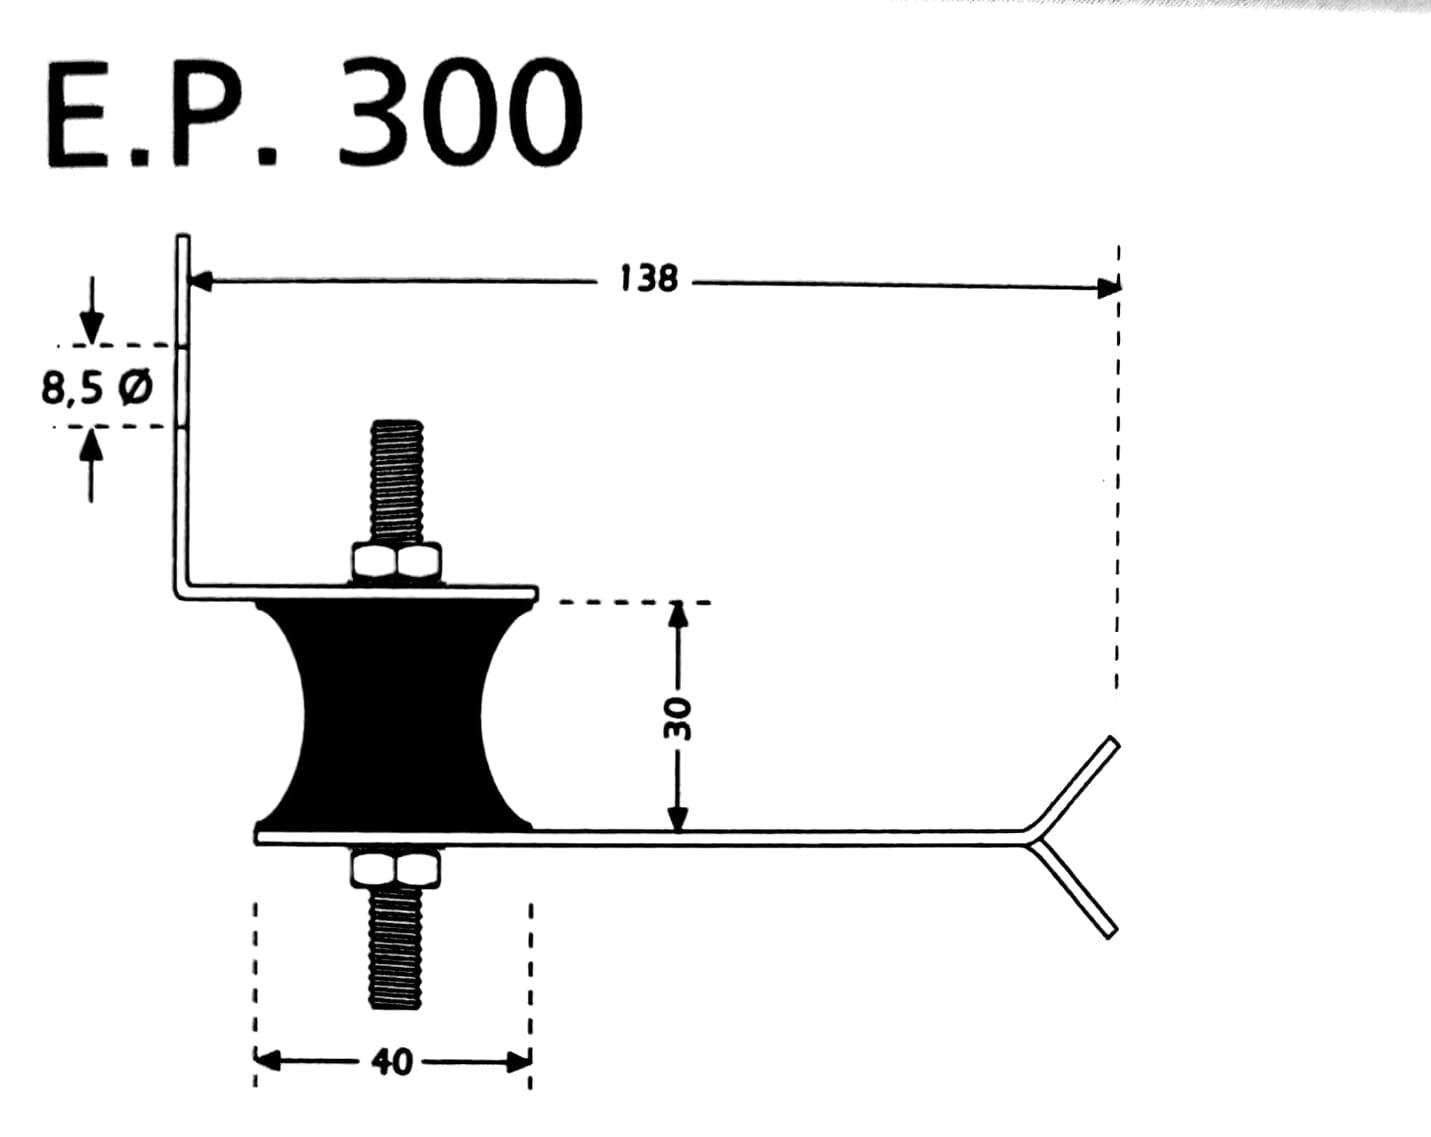 Custom EP300 wall vibration isolation mount